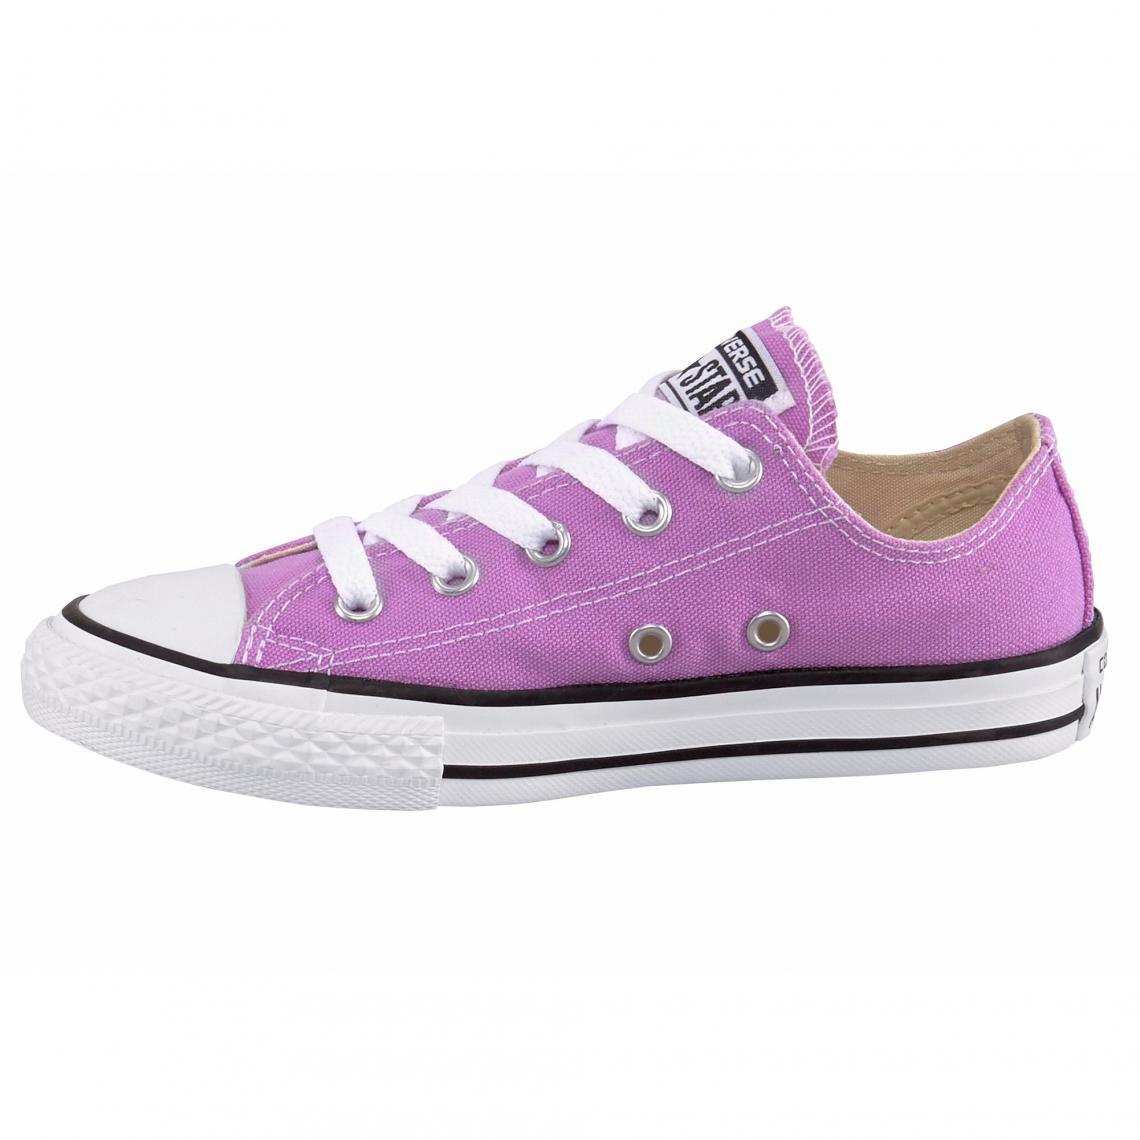 Taylor Ox Chuck En Toile Converse All Sneakers Basses Rose Star TwZPkOiulX